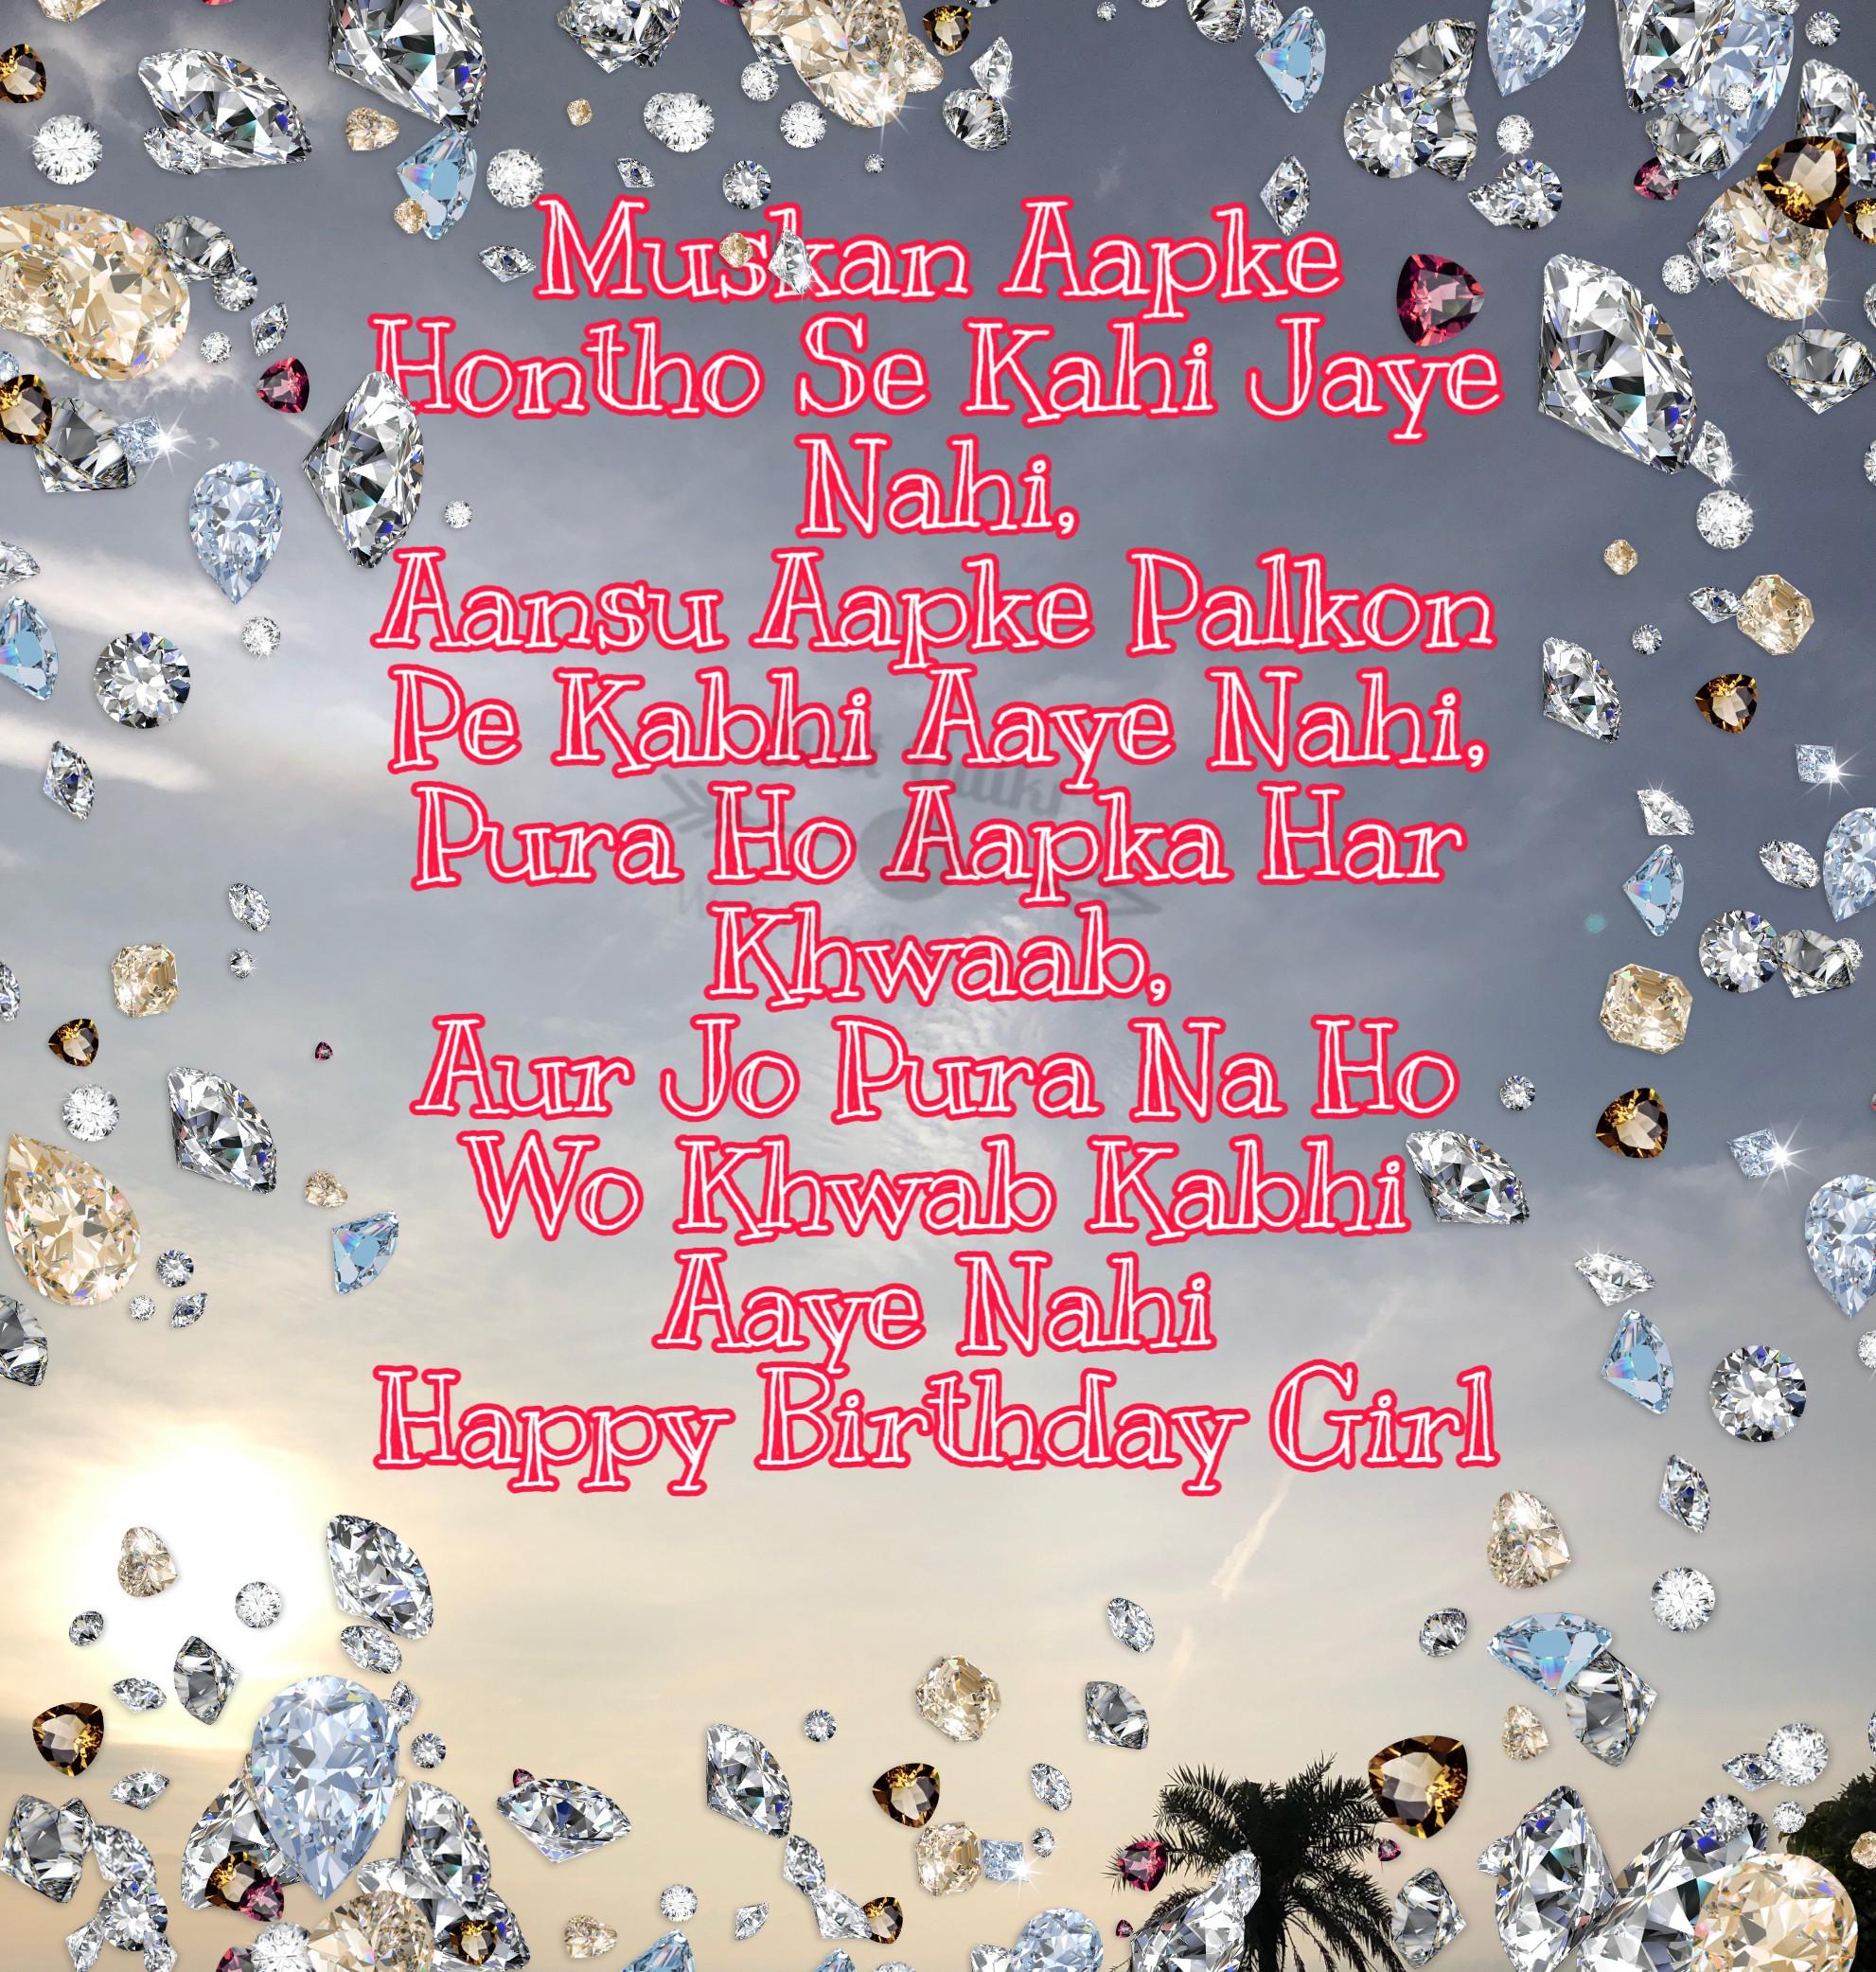 Happy Birthday Shayari Greetings Sayings SMS and Images for Girl